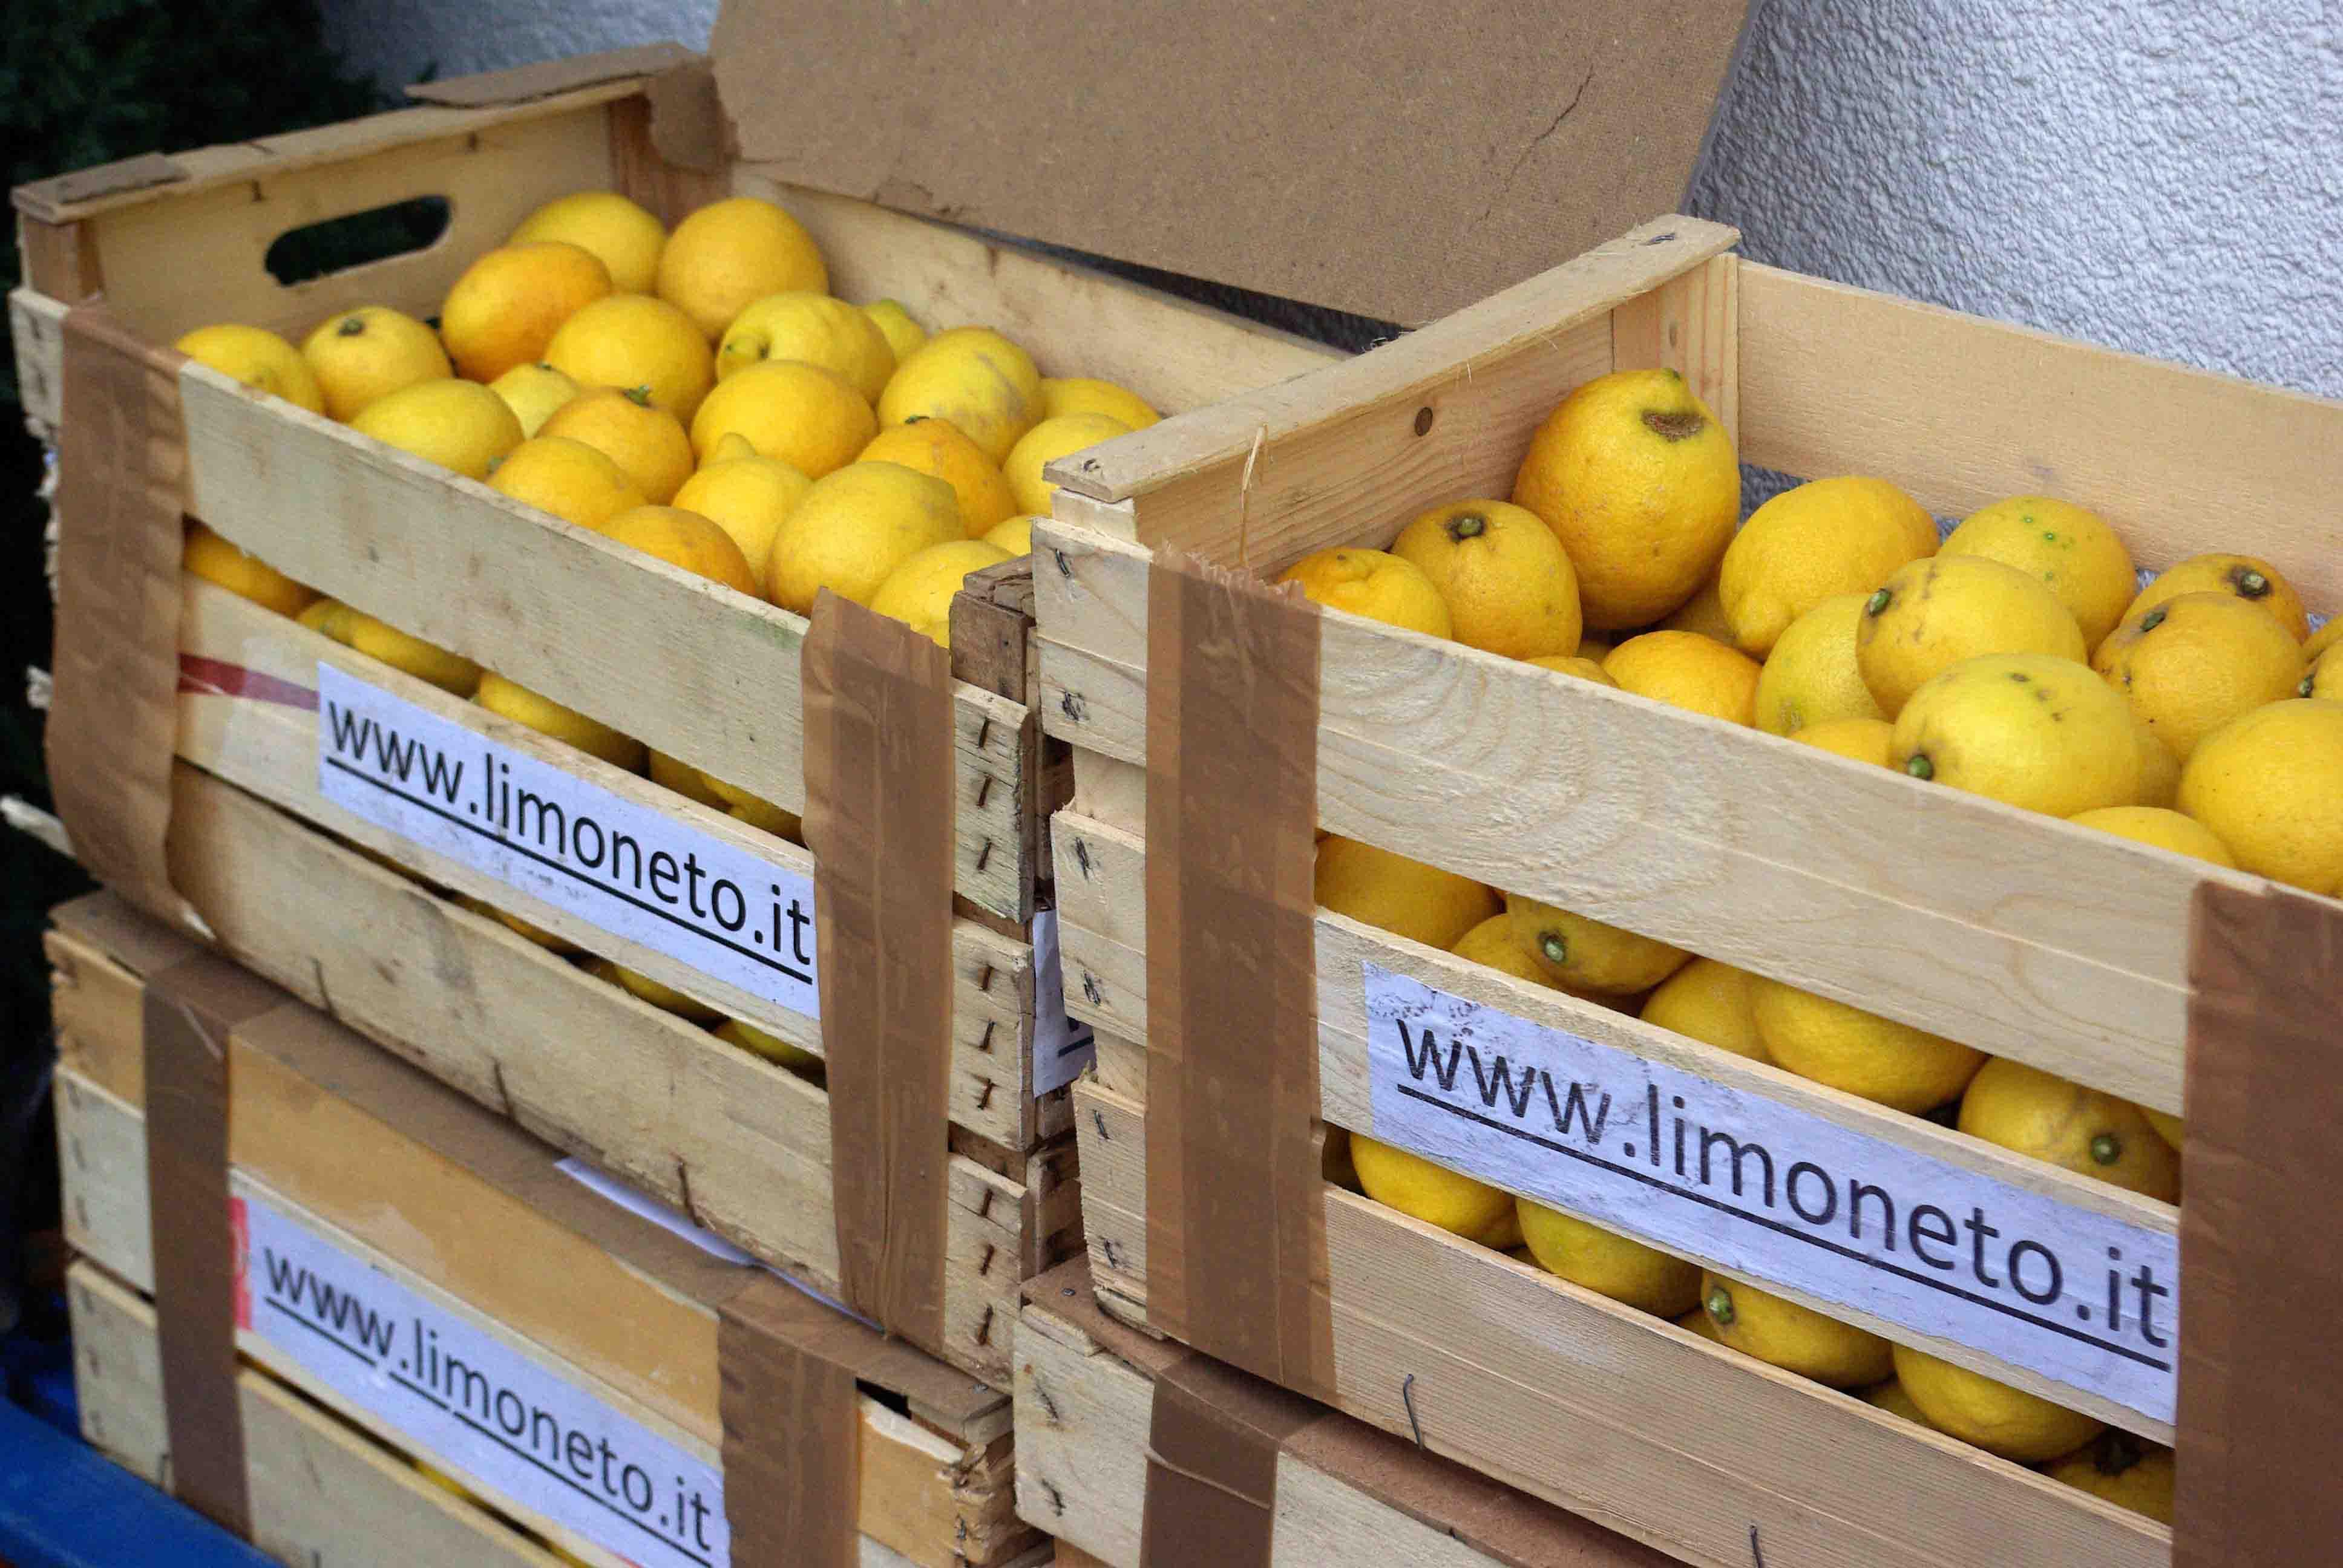 Zitronen für Pesto di Limone, Zitronenpesto, Zitronenwürzpesto